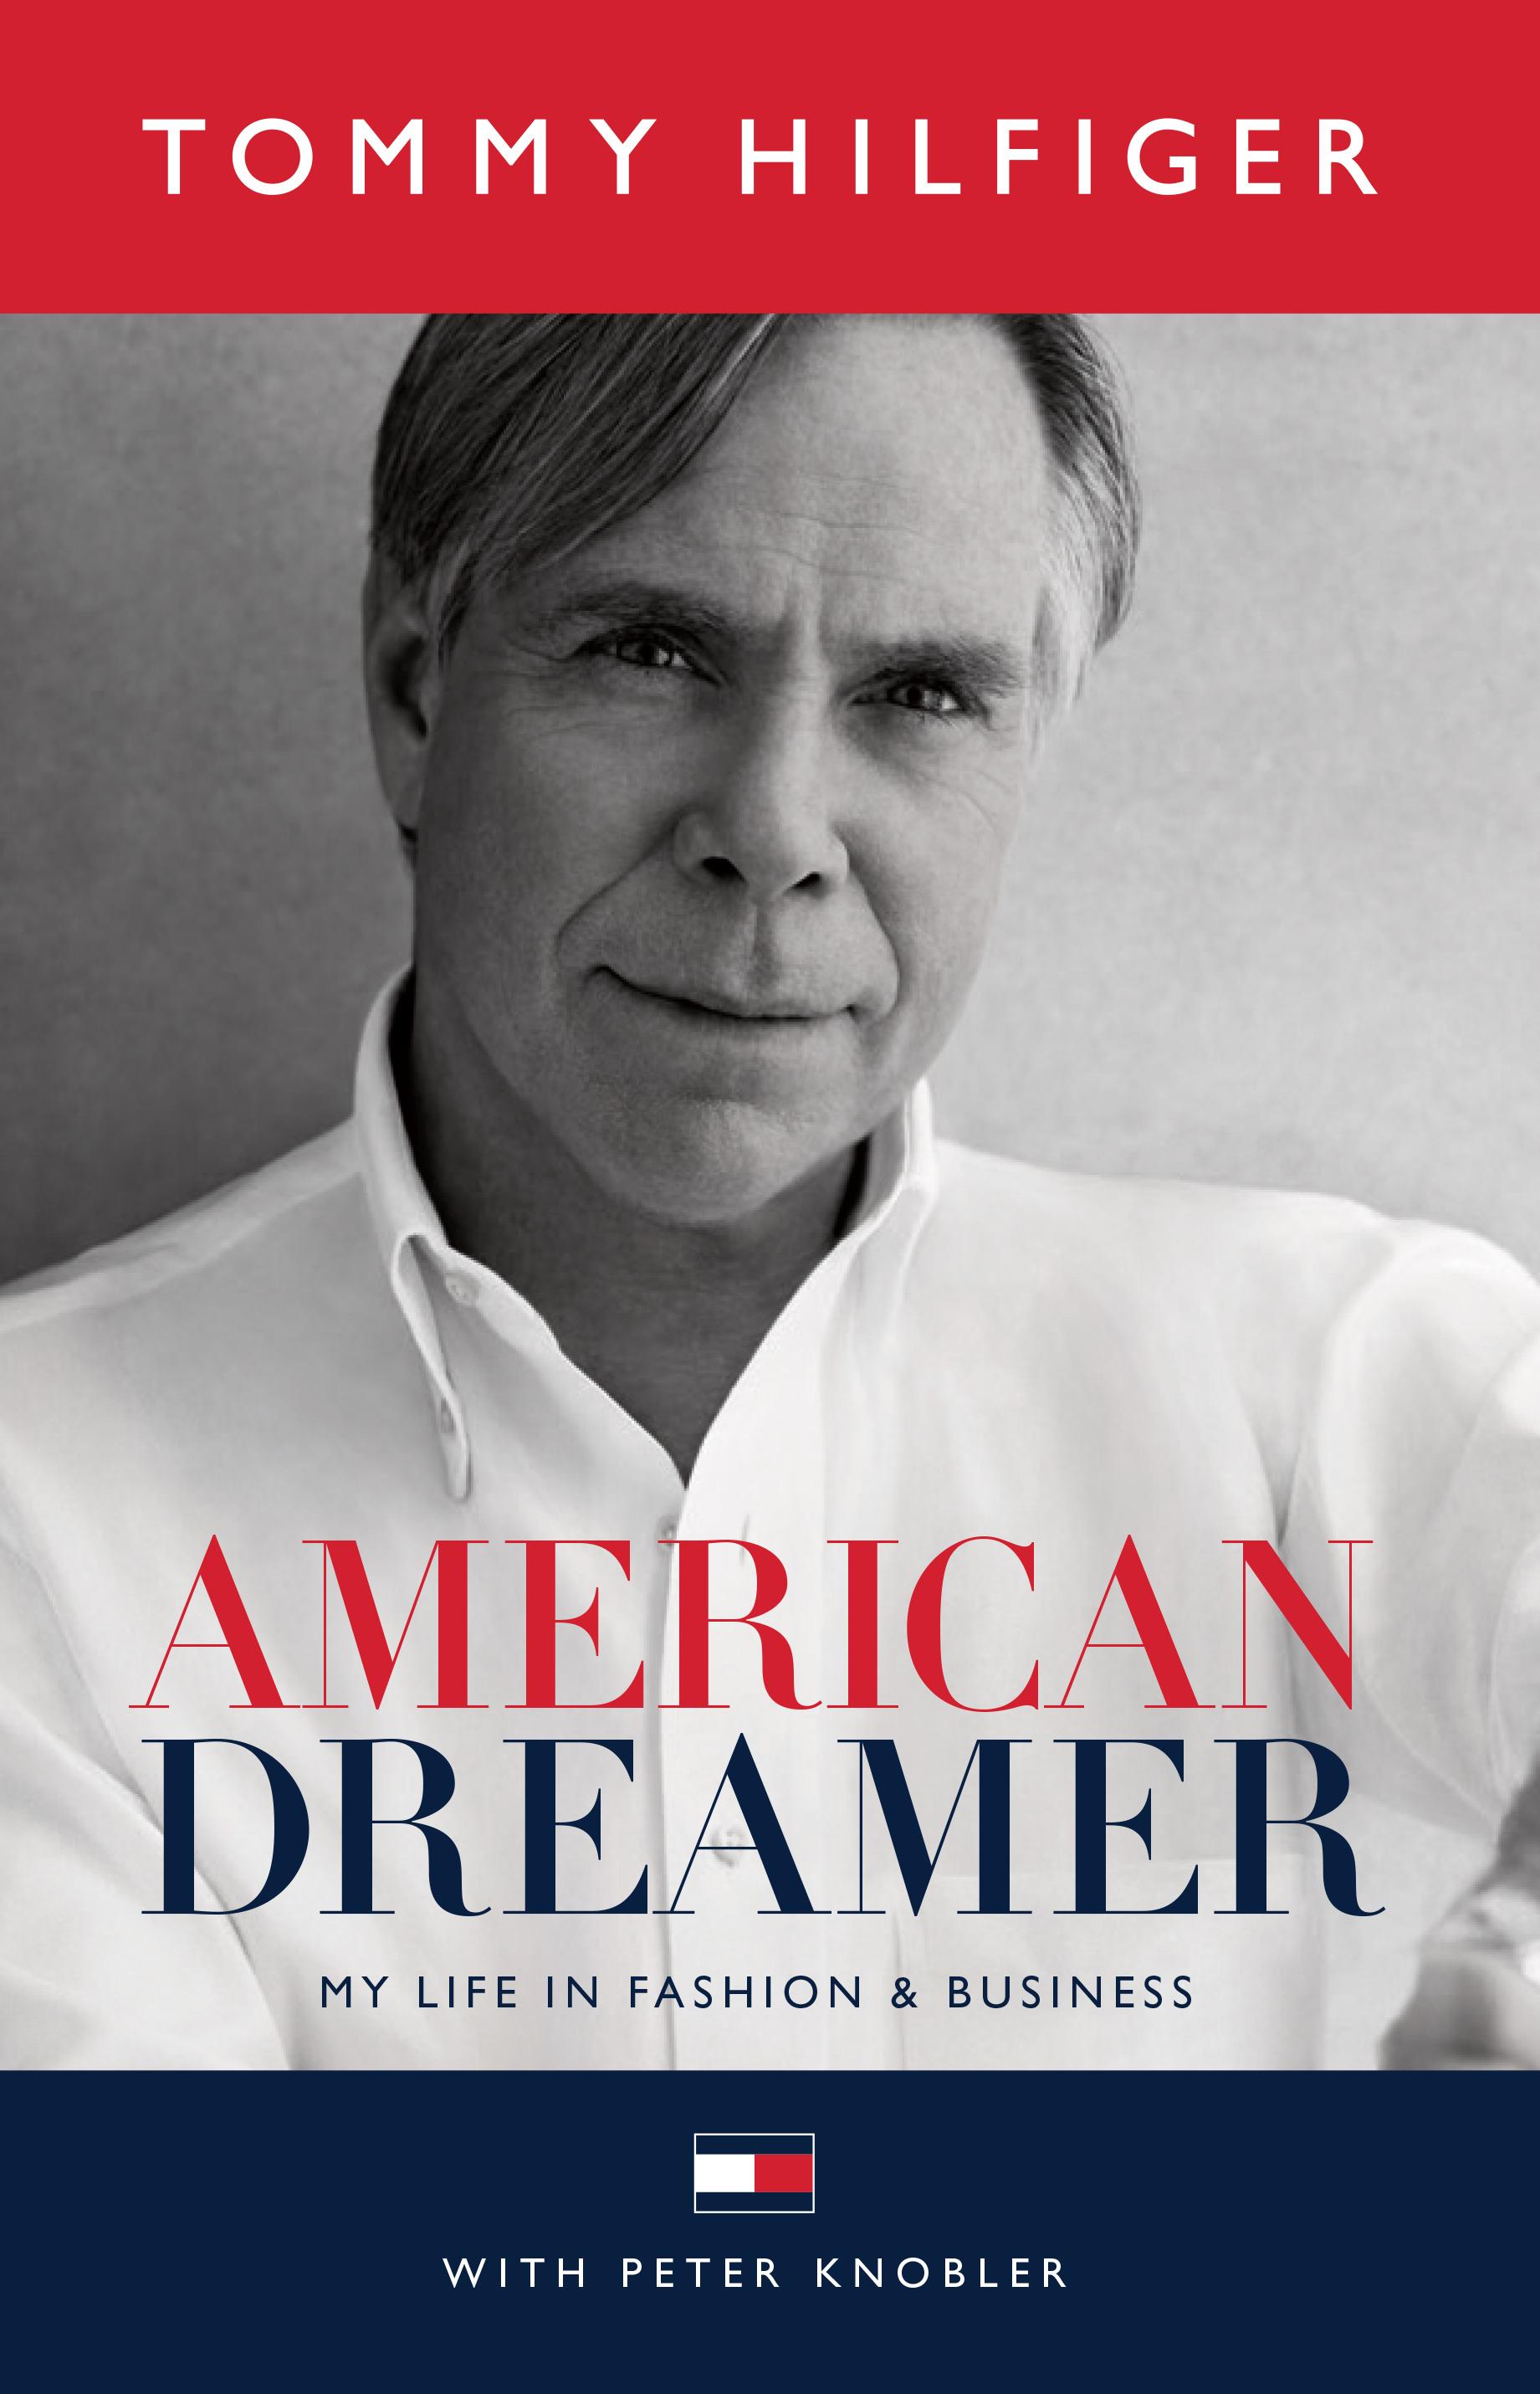 Tommy Hilfiger American Dreamer Memoir Cover